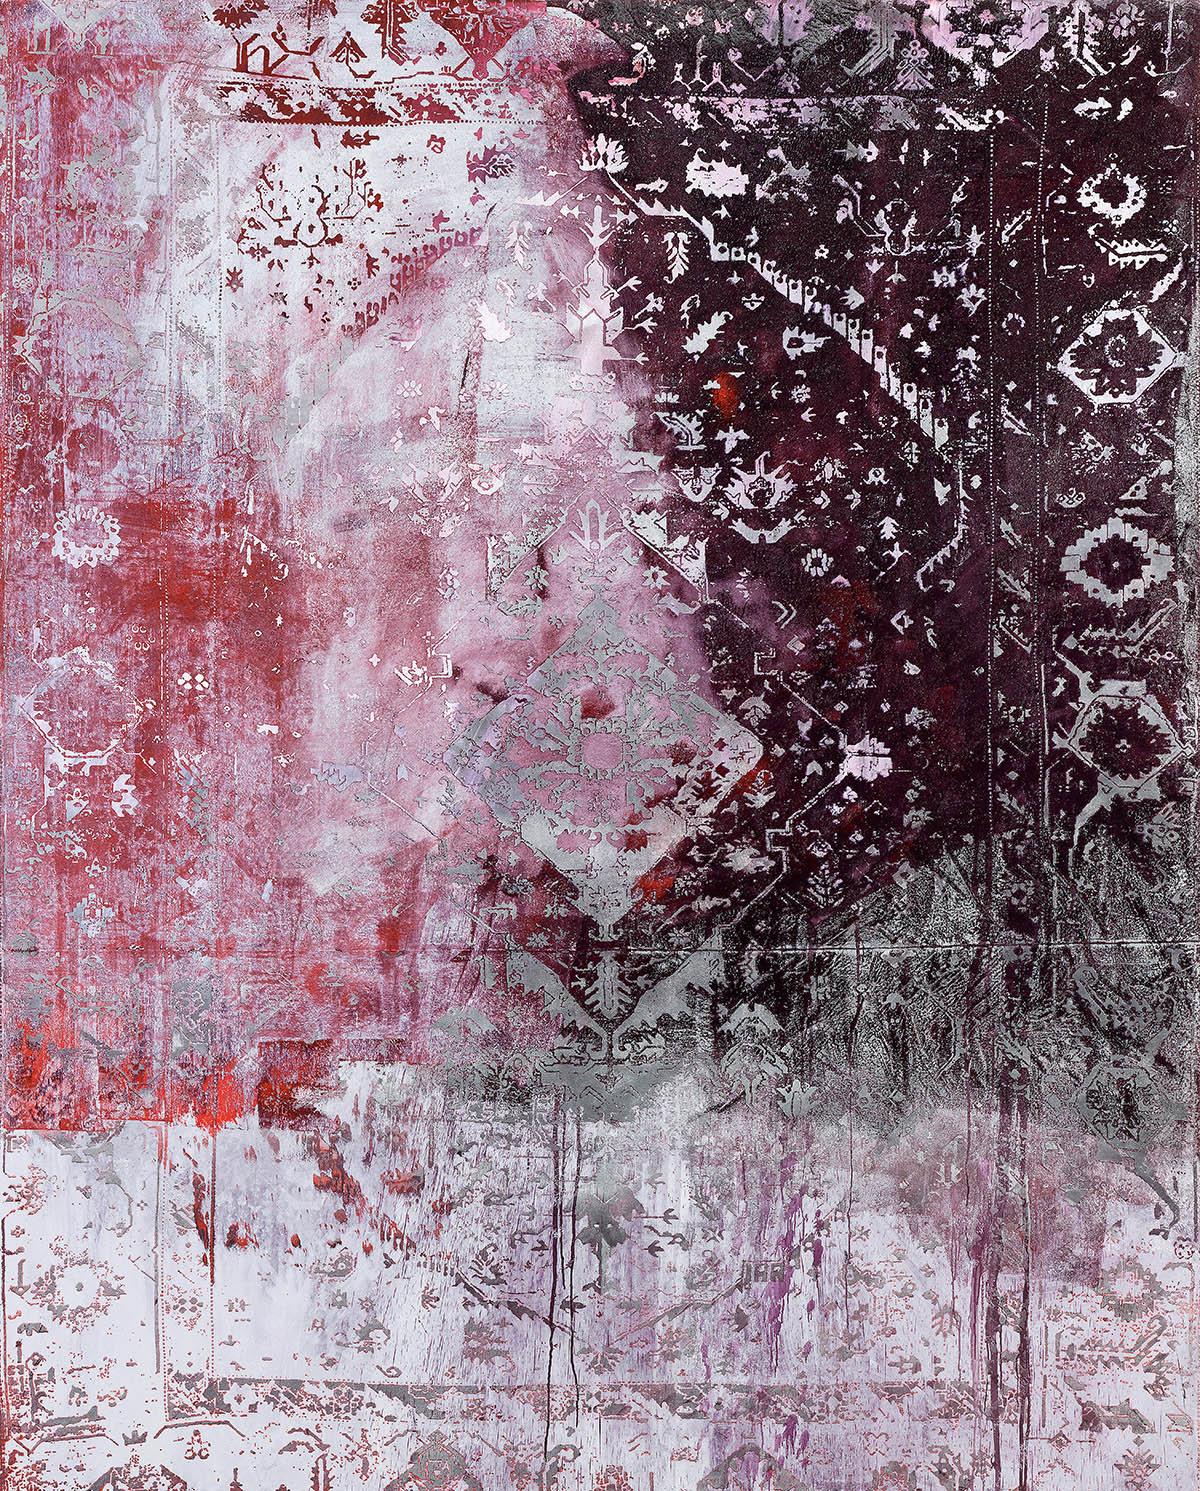 Rudolf Stingel, Untitled, 2012